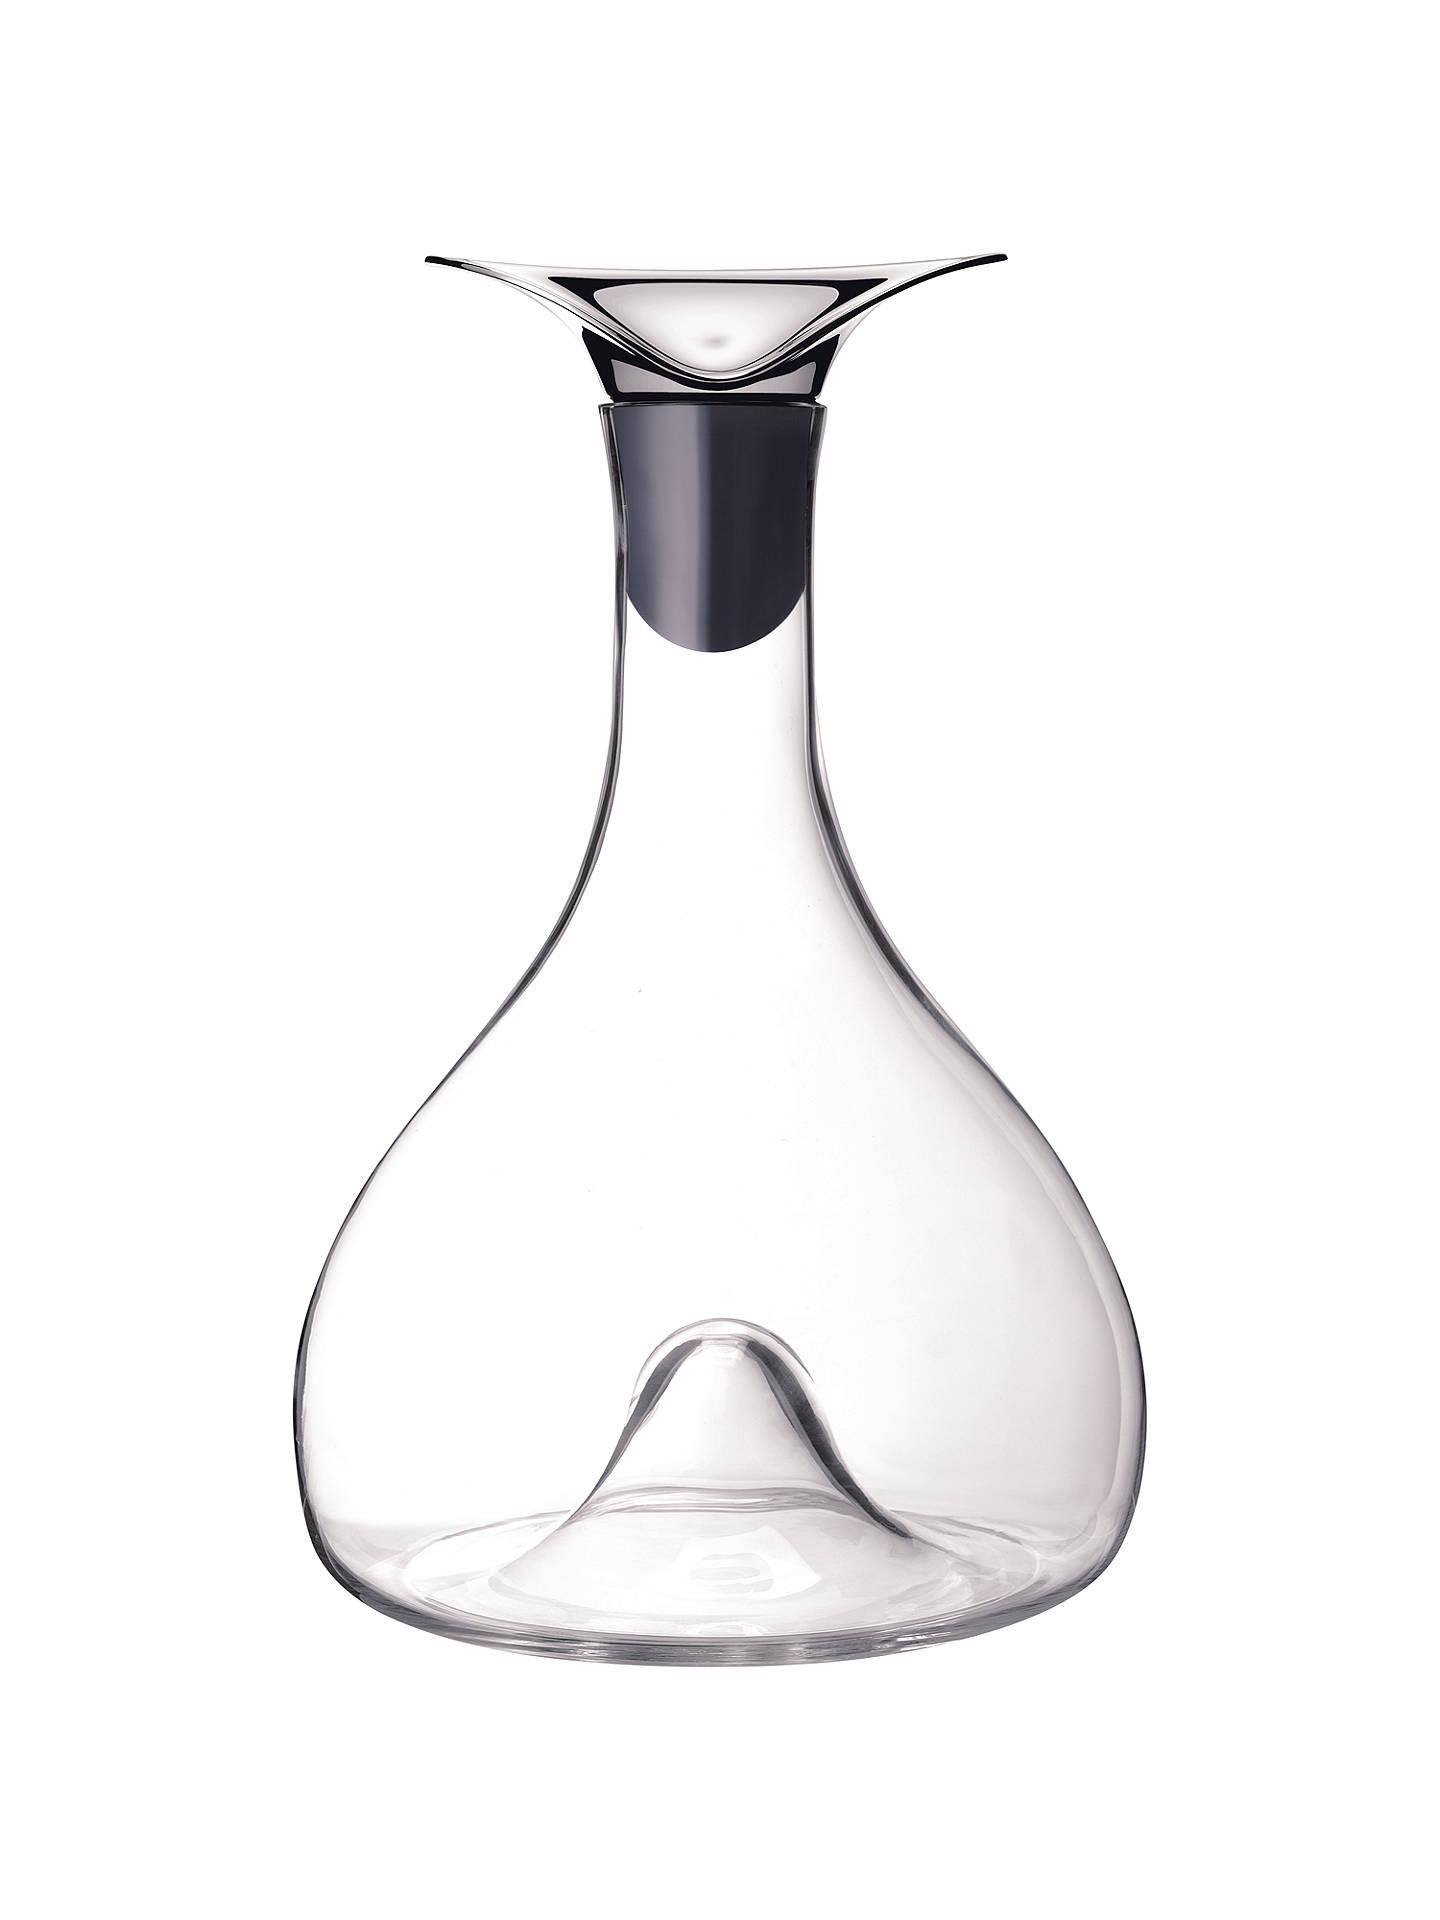 Buy Georg Jensen Wine Carafe, H26.7cm, Silver Online at johnlewis.com